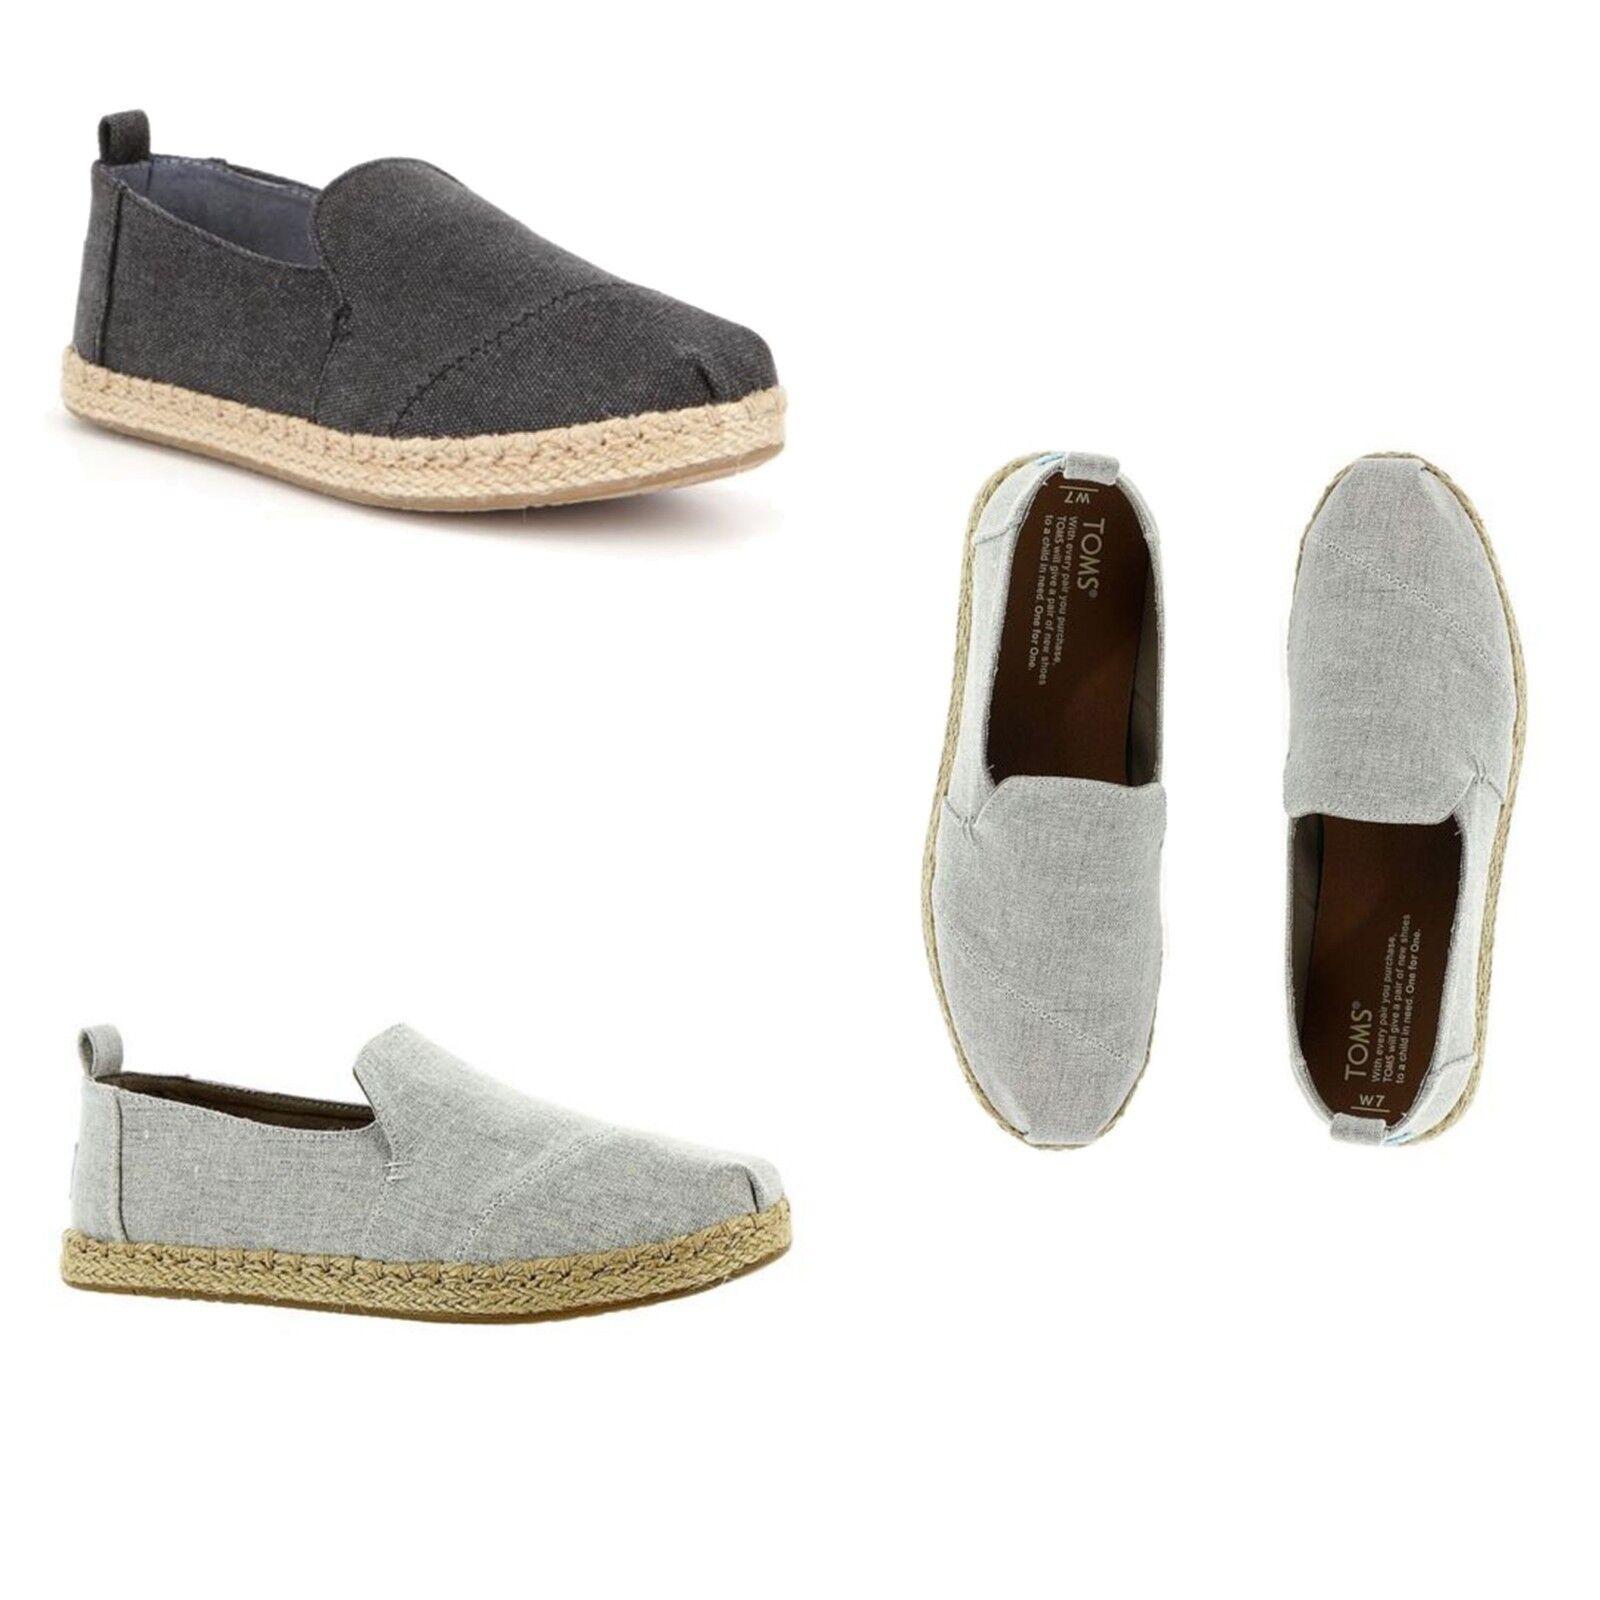 Toms Women's Casual Slip On Shoes Deconstructed Alpargata Espadrilles Flats NEW